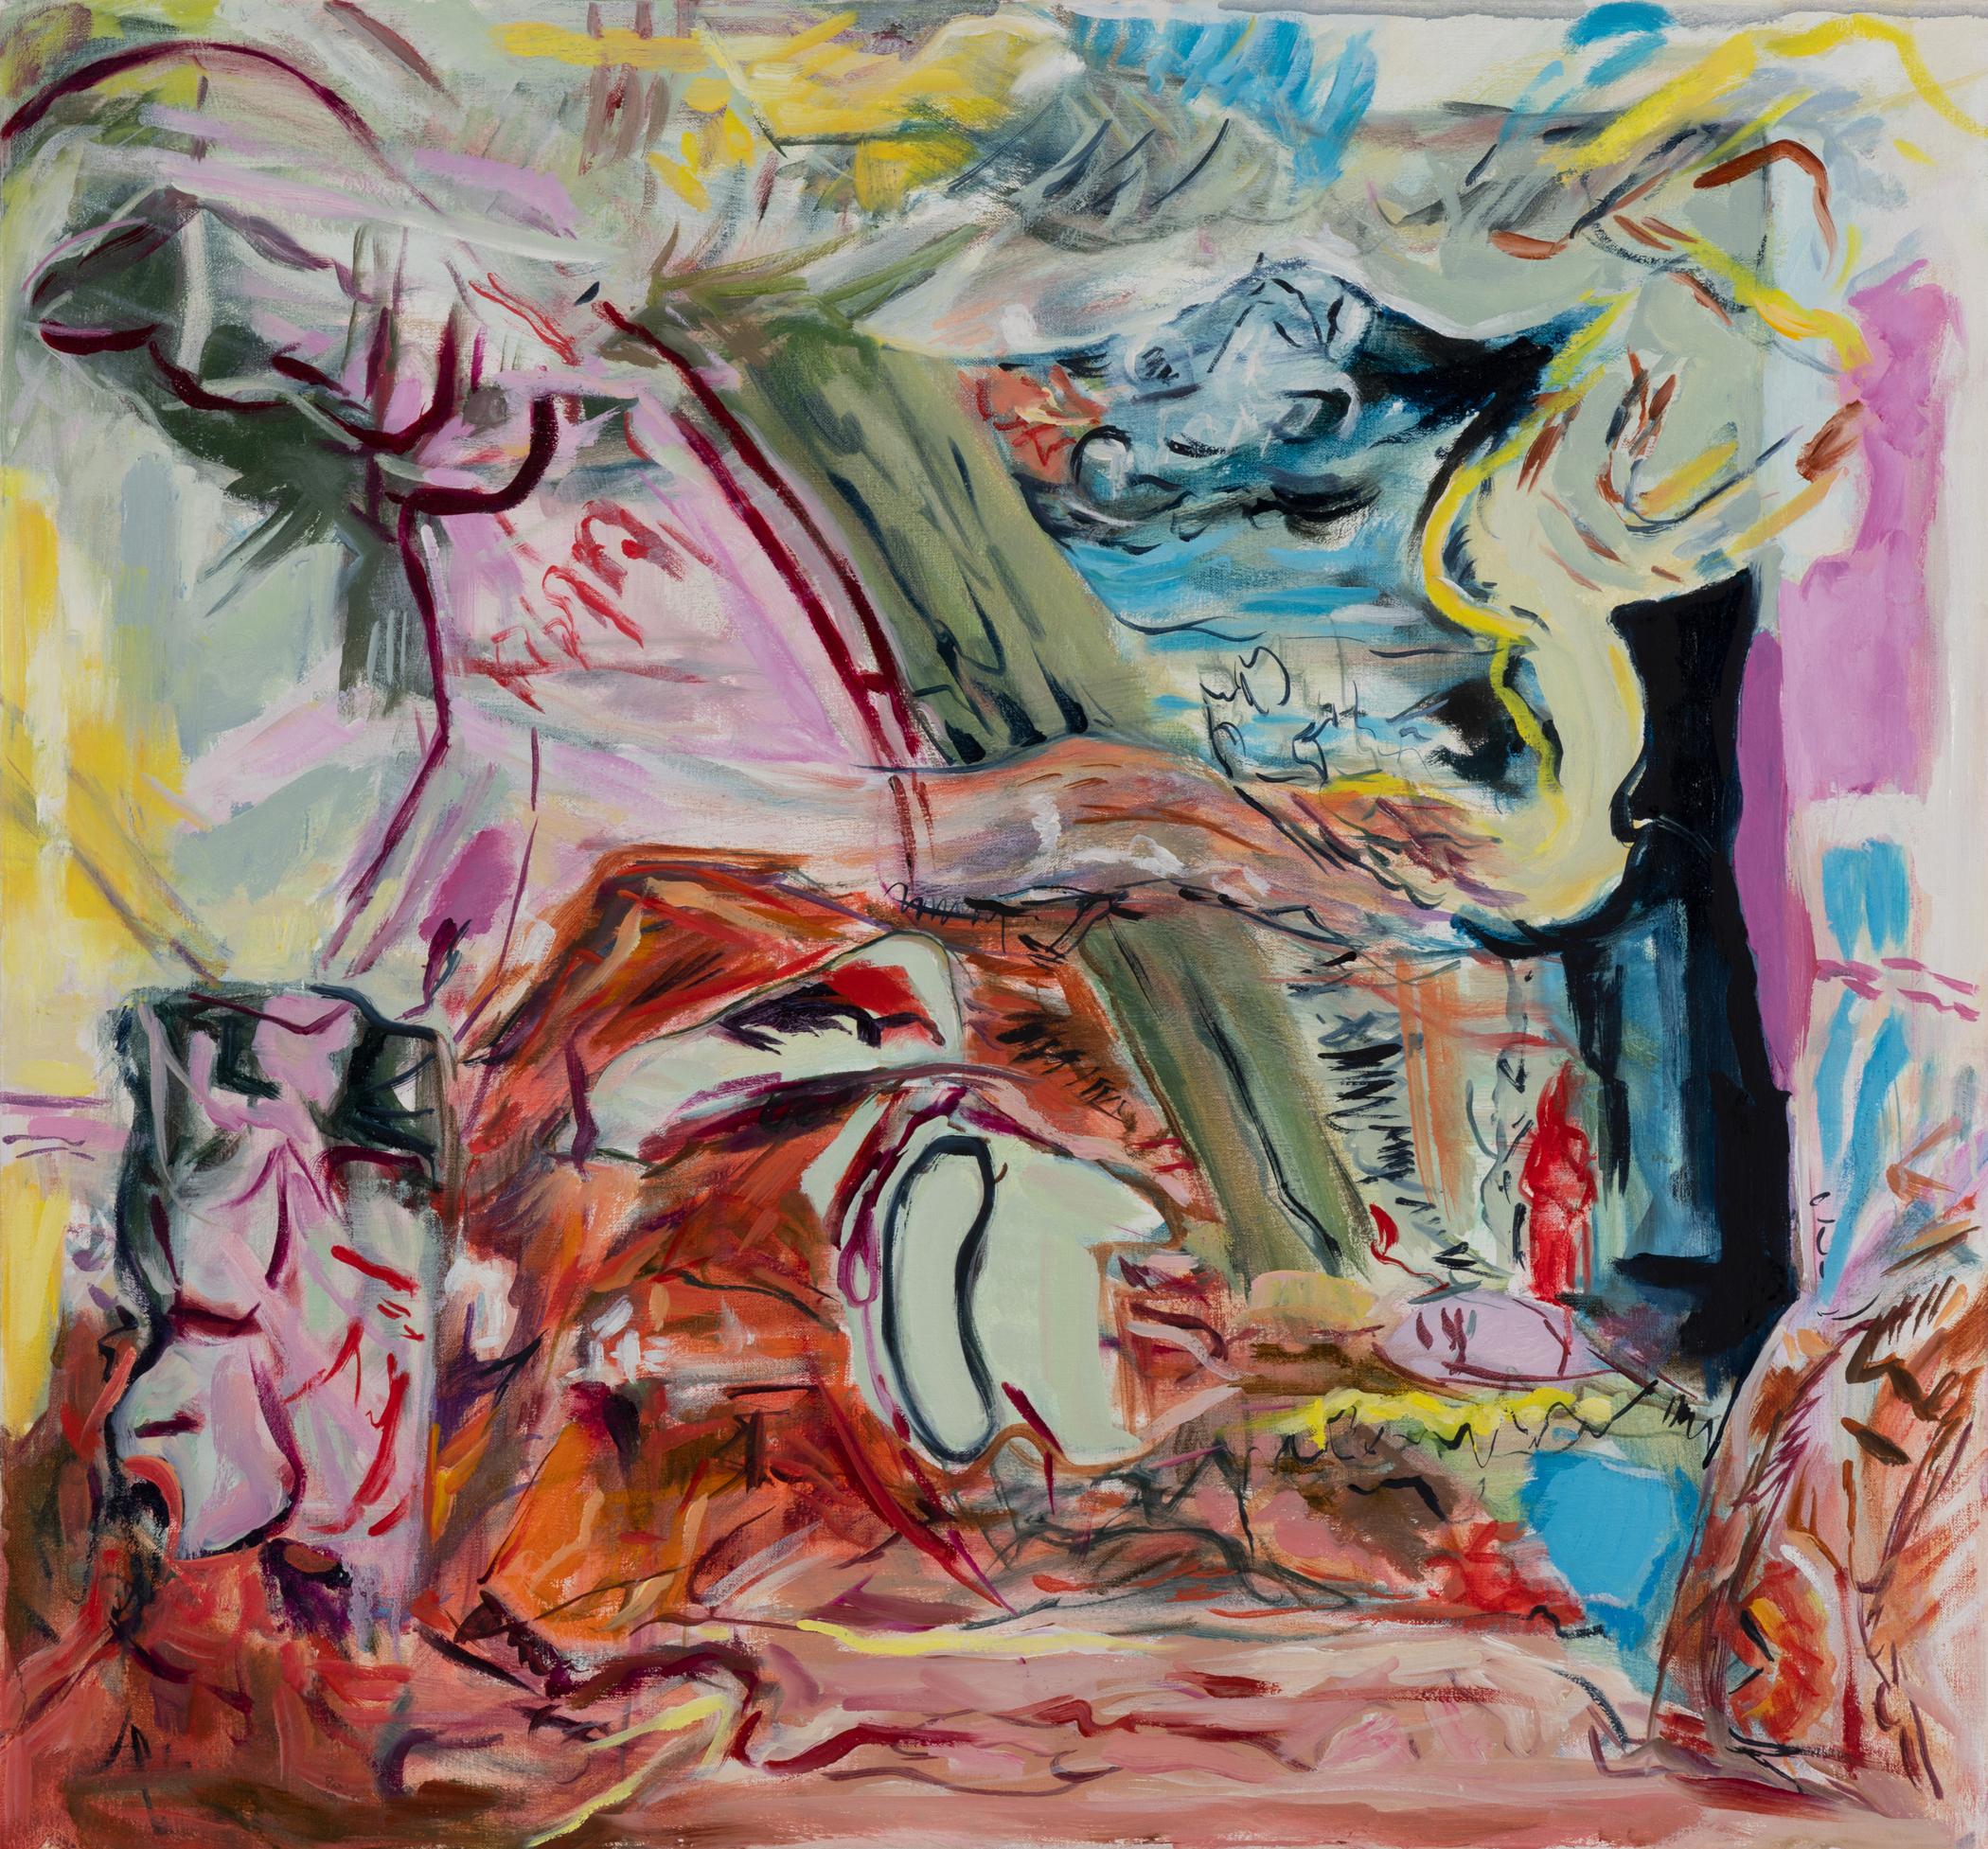 Kolman & Pryor Gallery_Jil Evans_Heart Bright Dark 2_2019_oil on canvas_30 x 32 inches_�2700.jpg